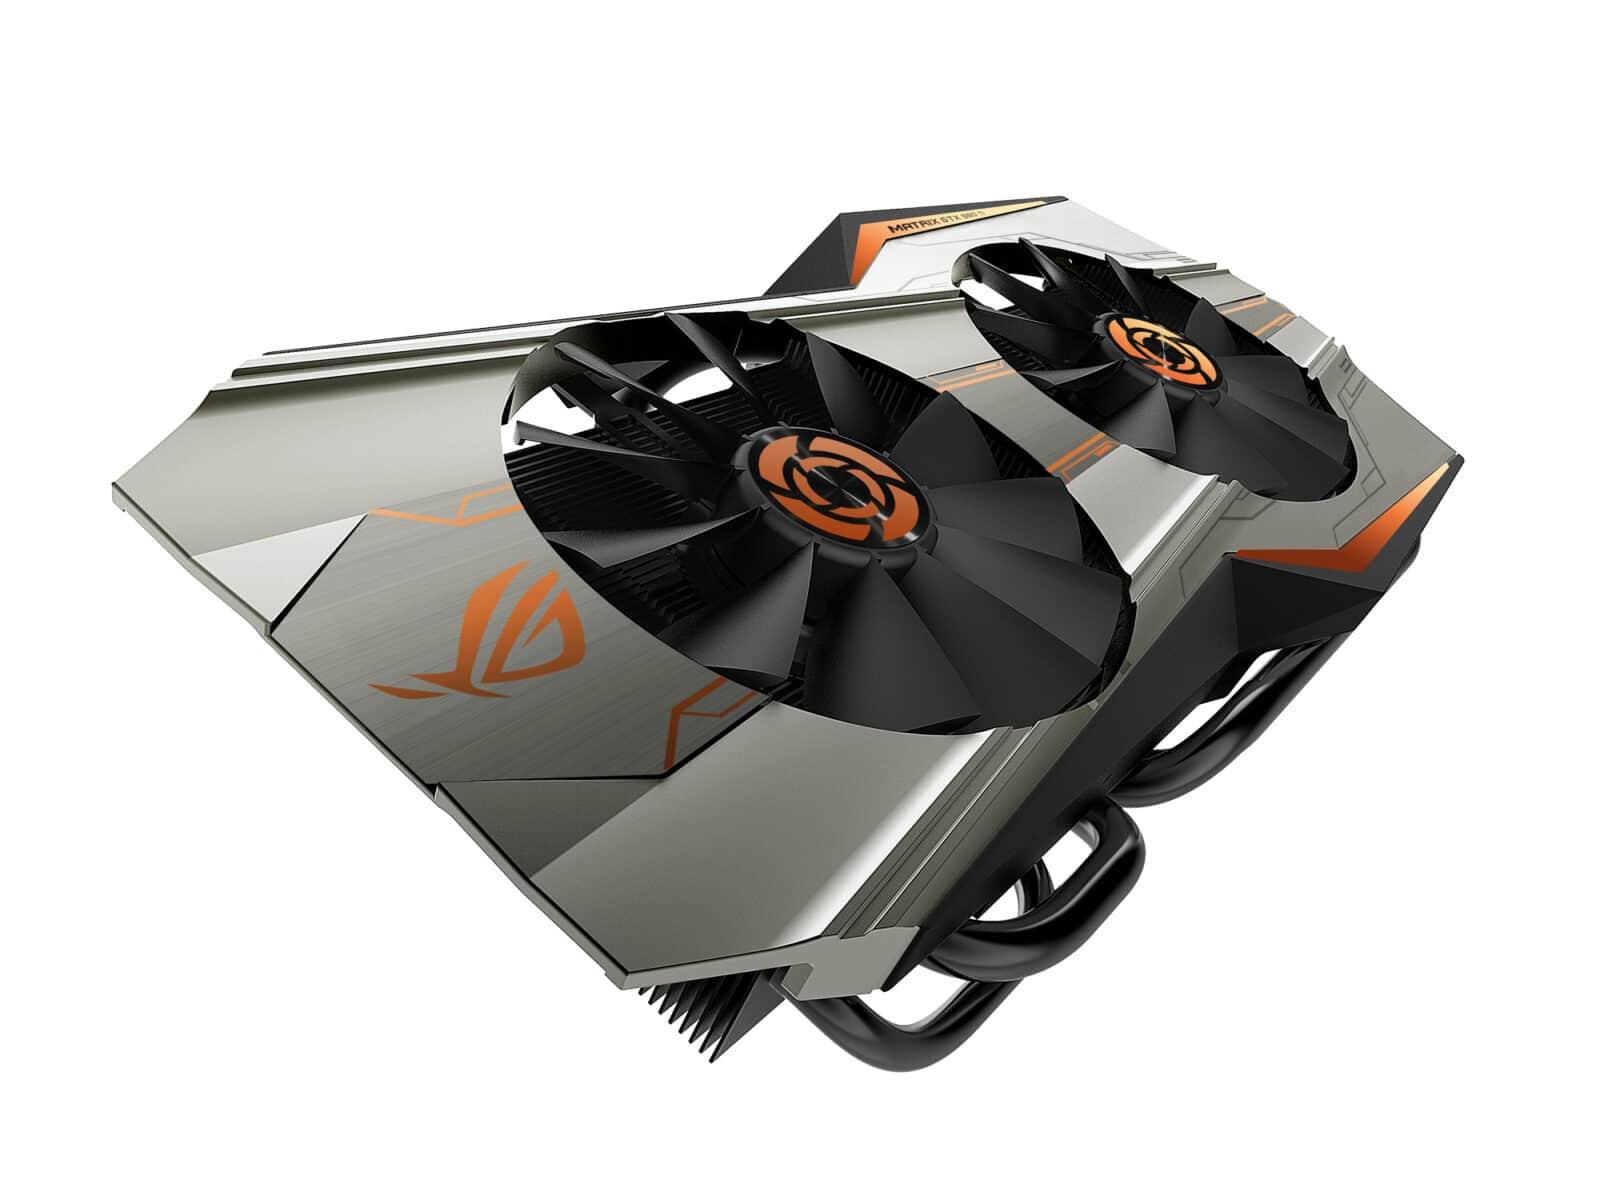 Review - Asus GeForce GTX980 Ti Matrix Platinum